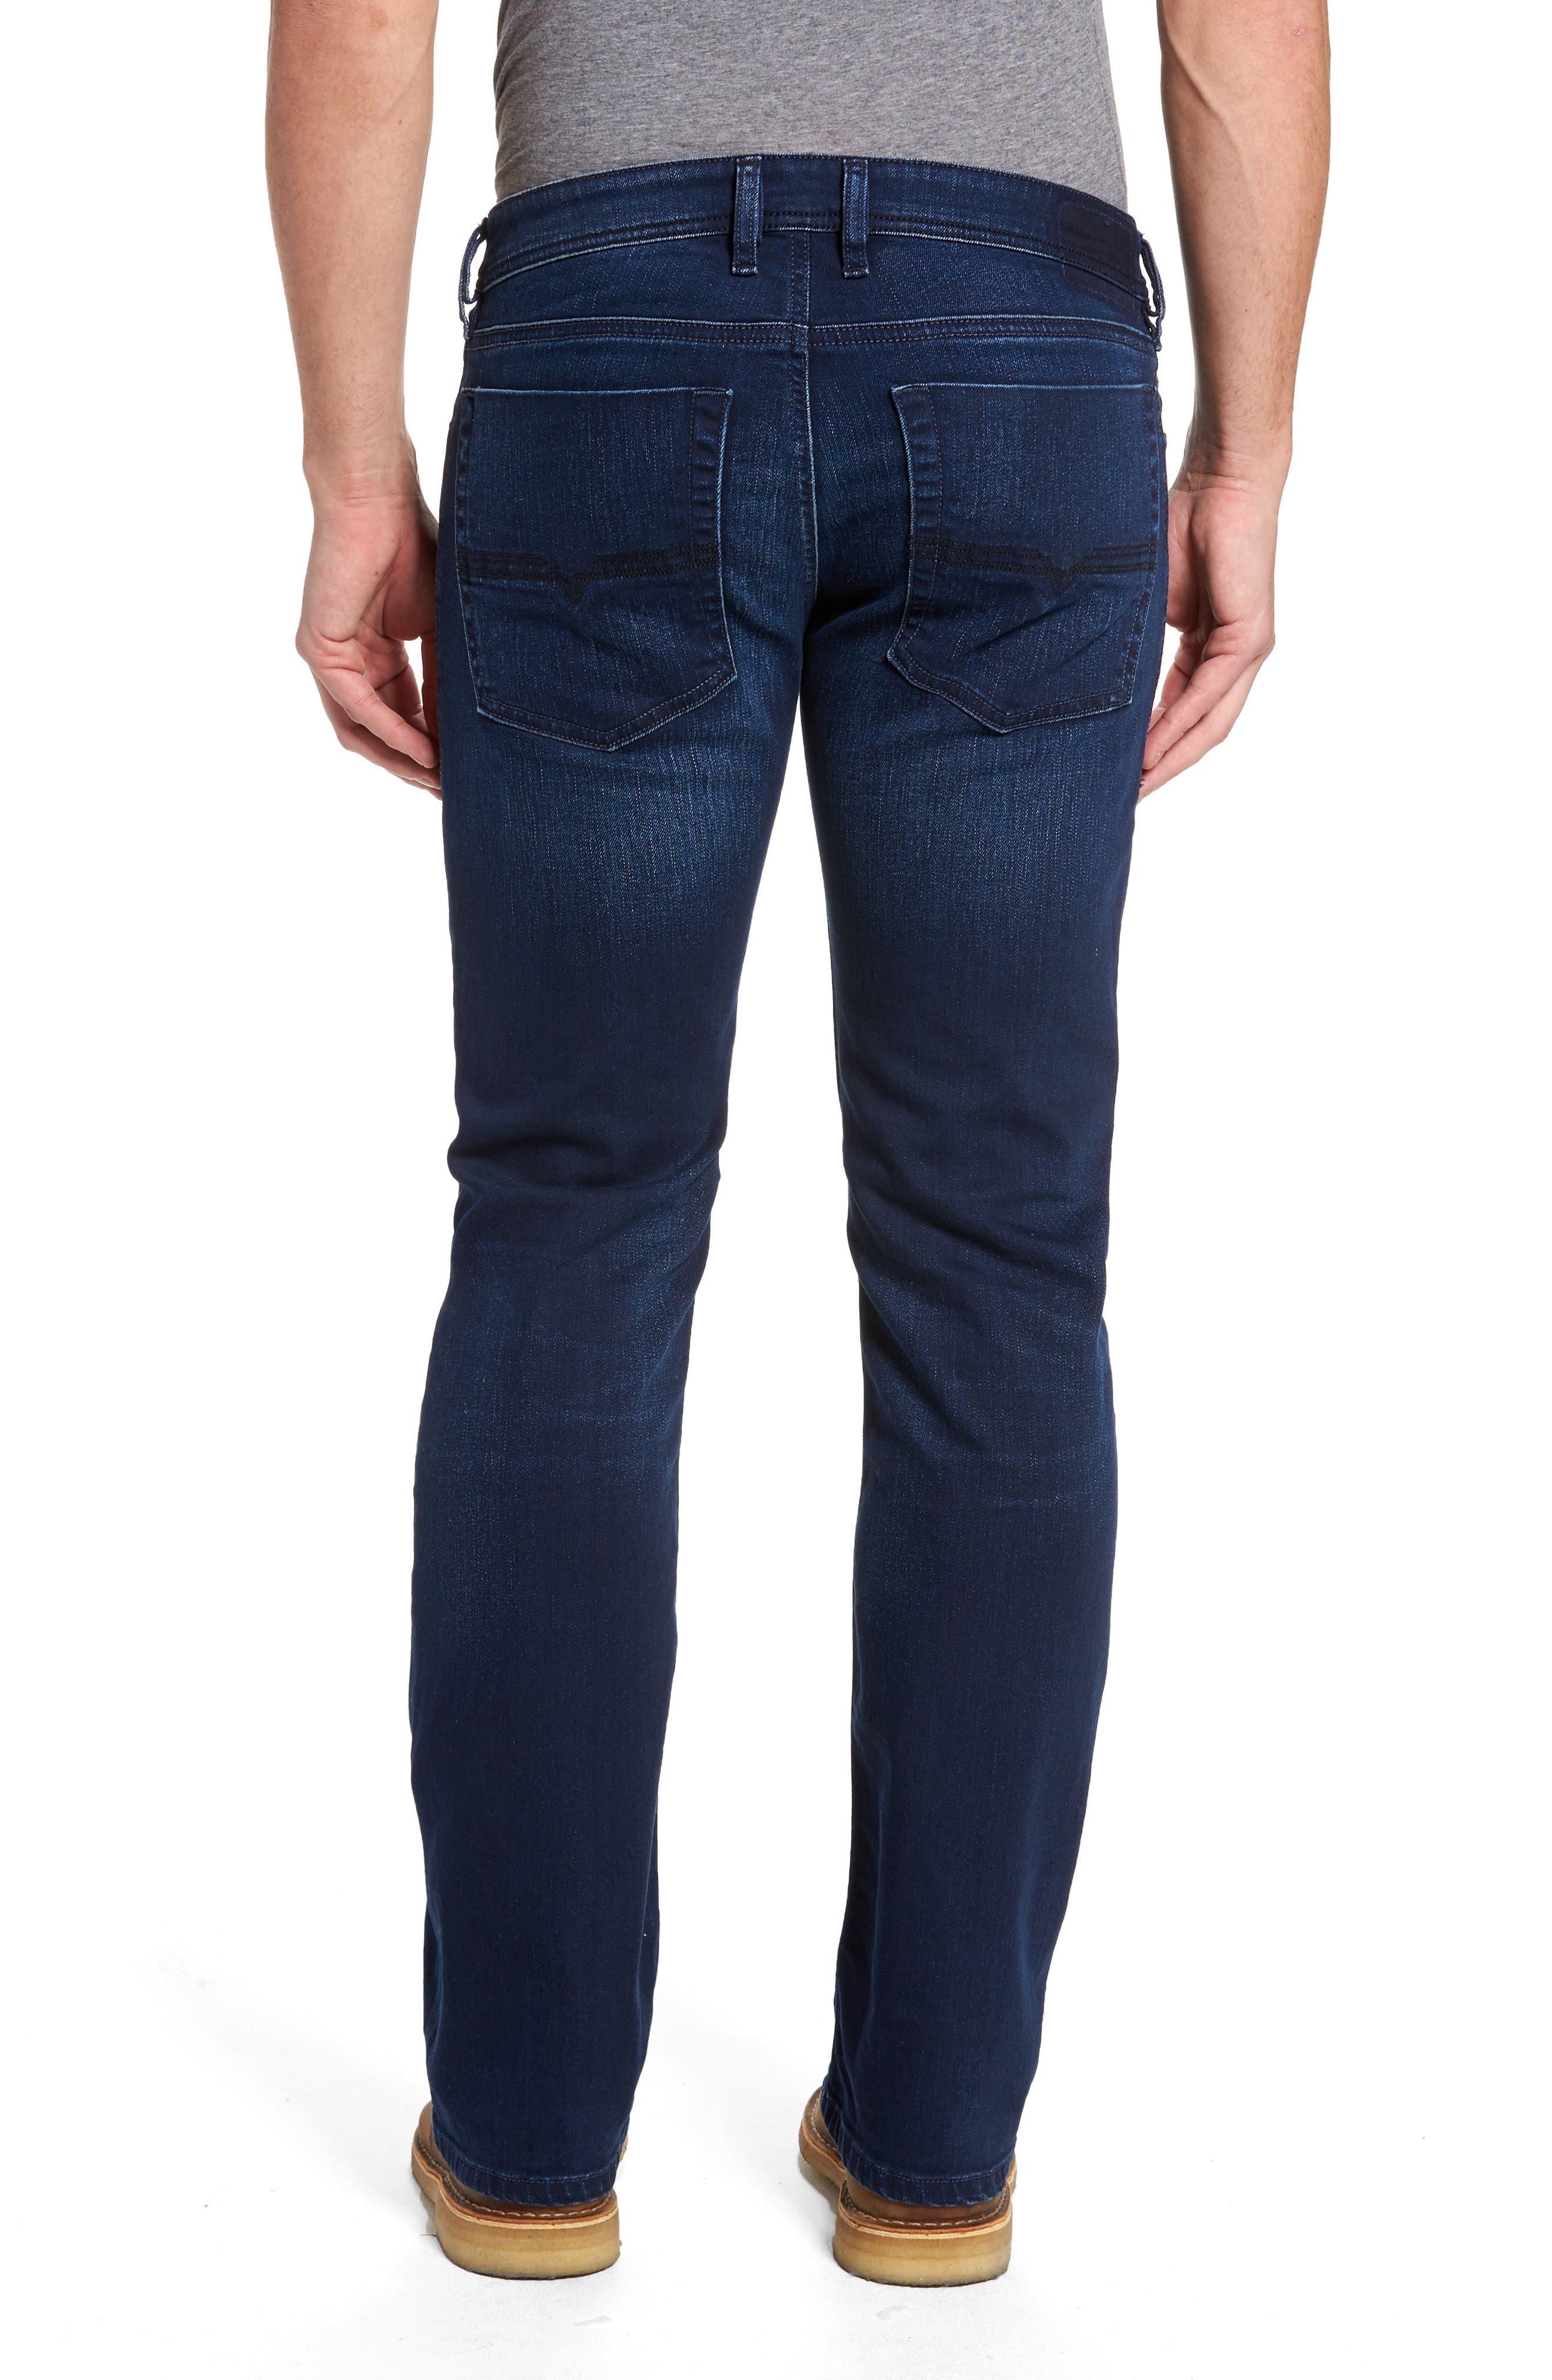 Zatiny Bootcut Jeans,                             Alternate thumbnail 2, color,                             84Hj